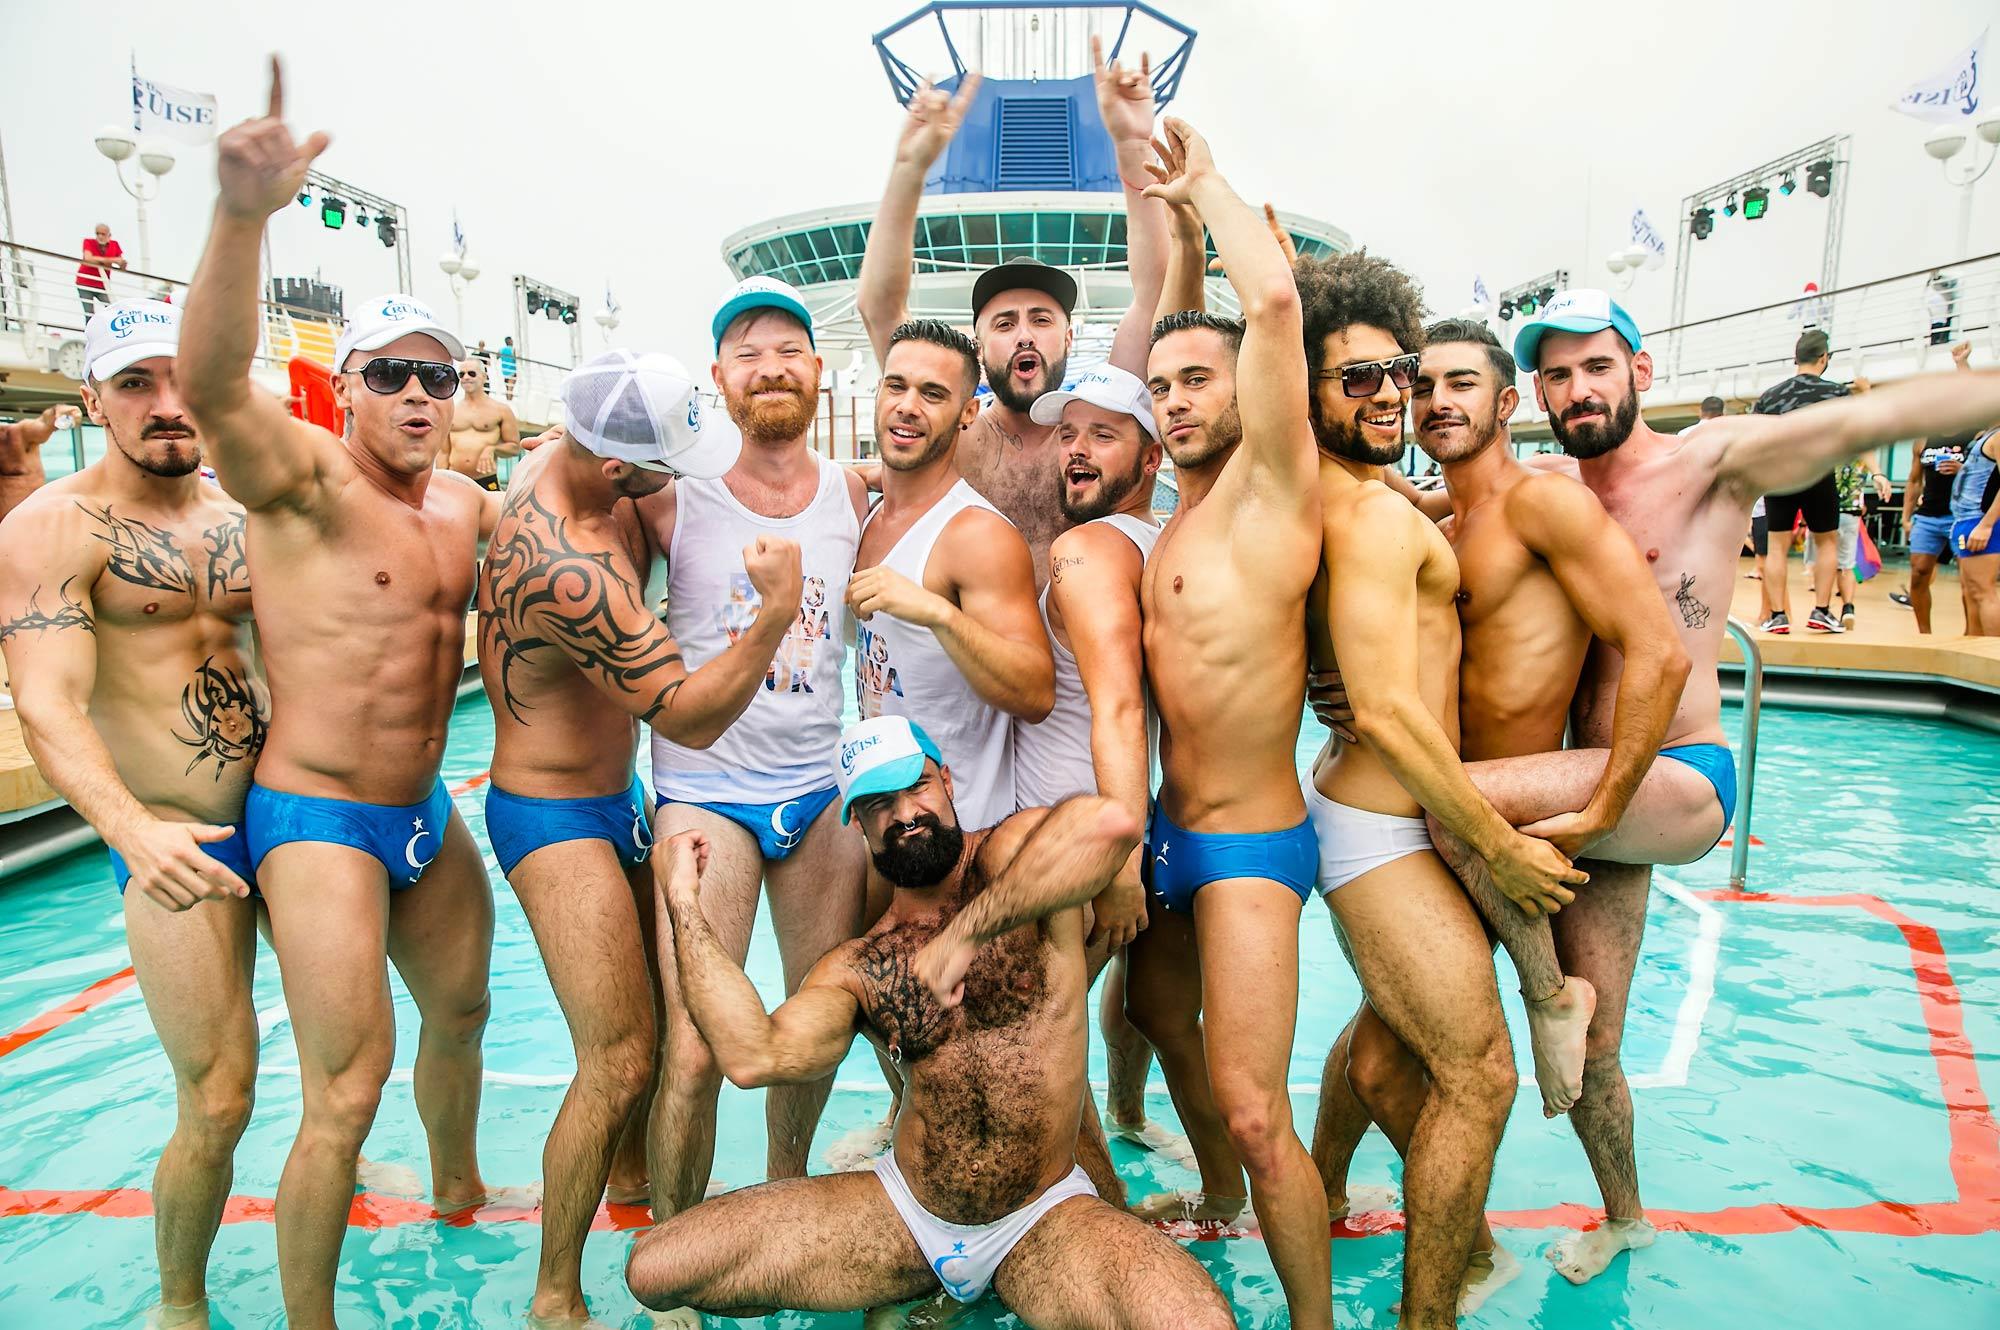 maryland gay cam